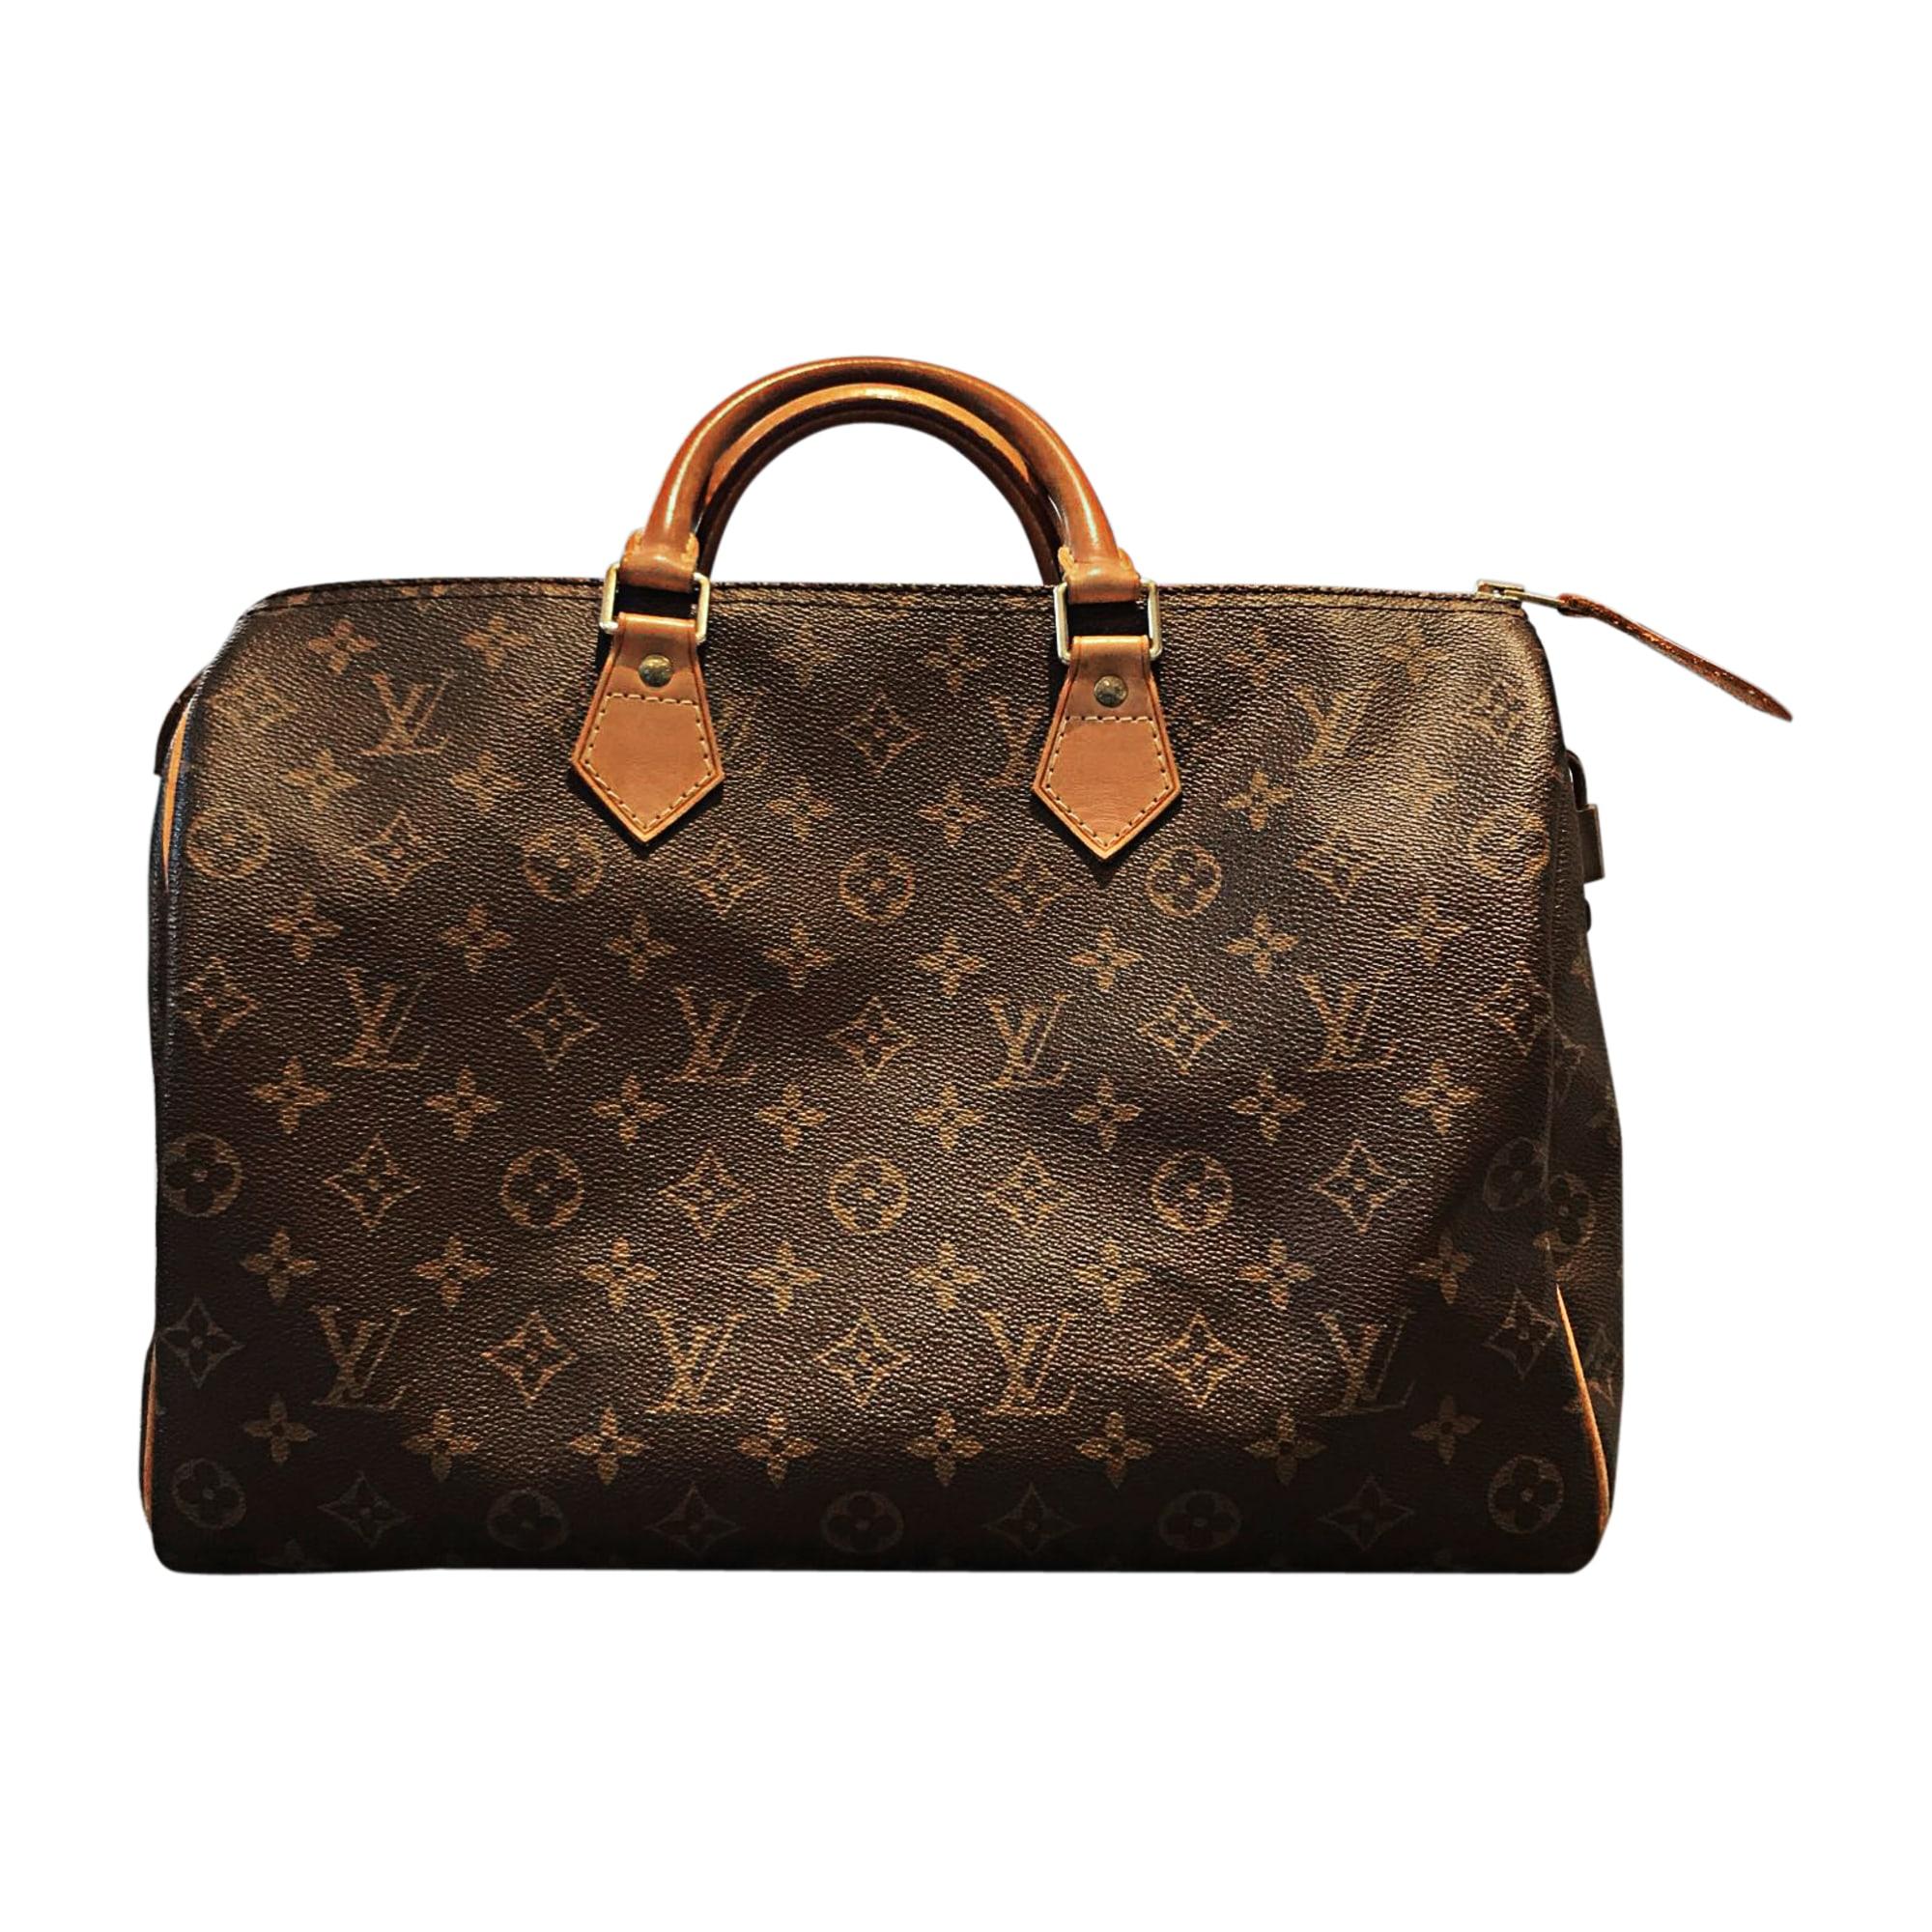 Leather Handbag LOUIS VUITTON Speedy Beige, camel